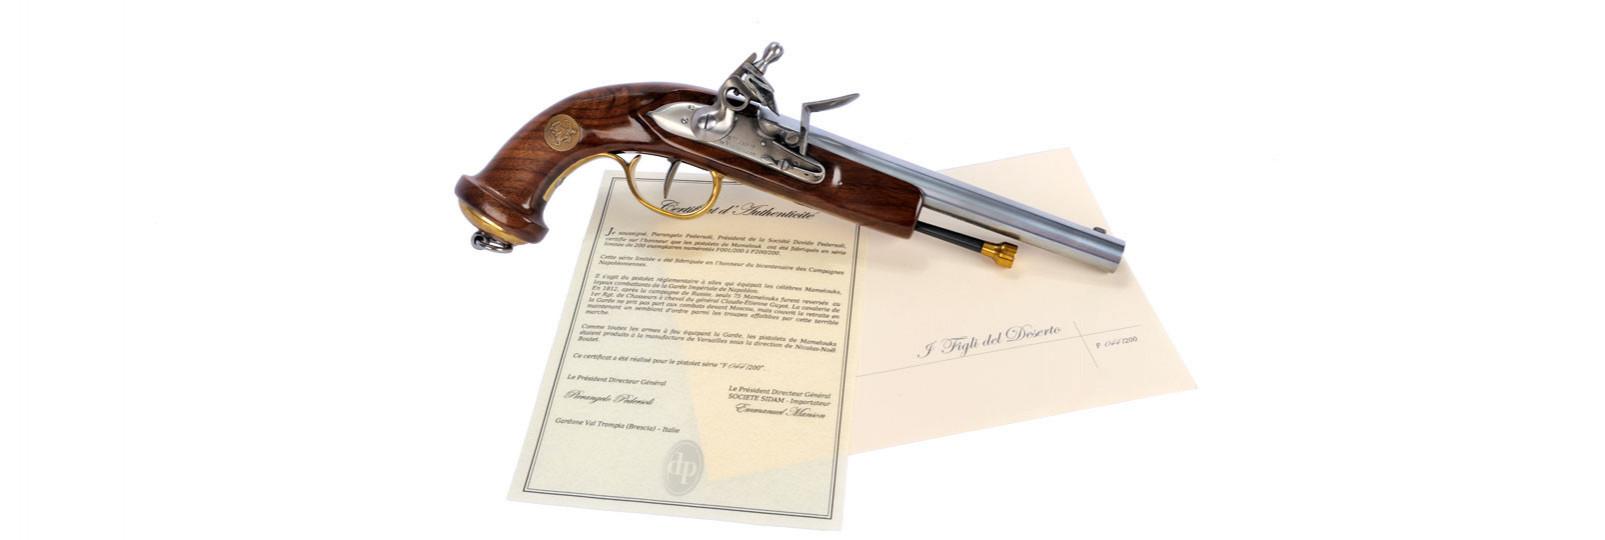 Mamelouk commemorative Pistol